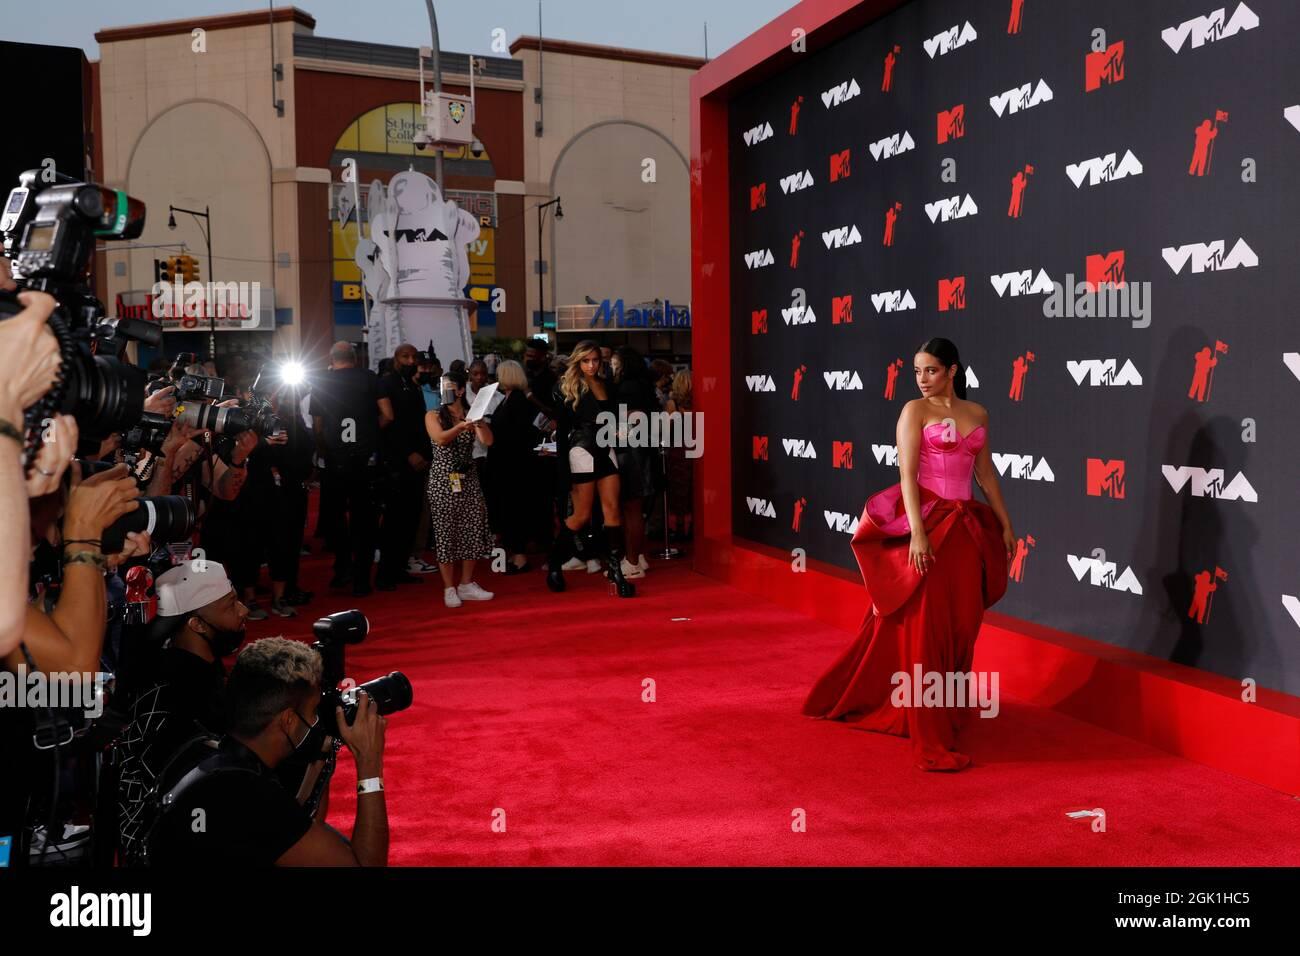 2021 MTV Video Music Awards - Arrivi - Barclays Center, Brooklyn, New York, USA, Settembre 12, 2021 - Camila Cabello. REUTERS/Andrew Kelly Foto Stock